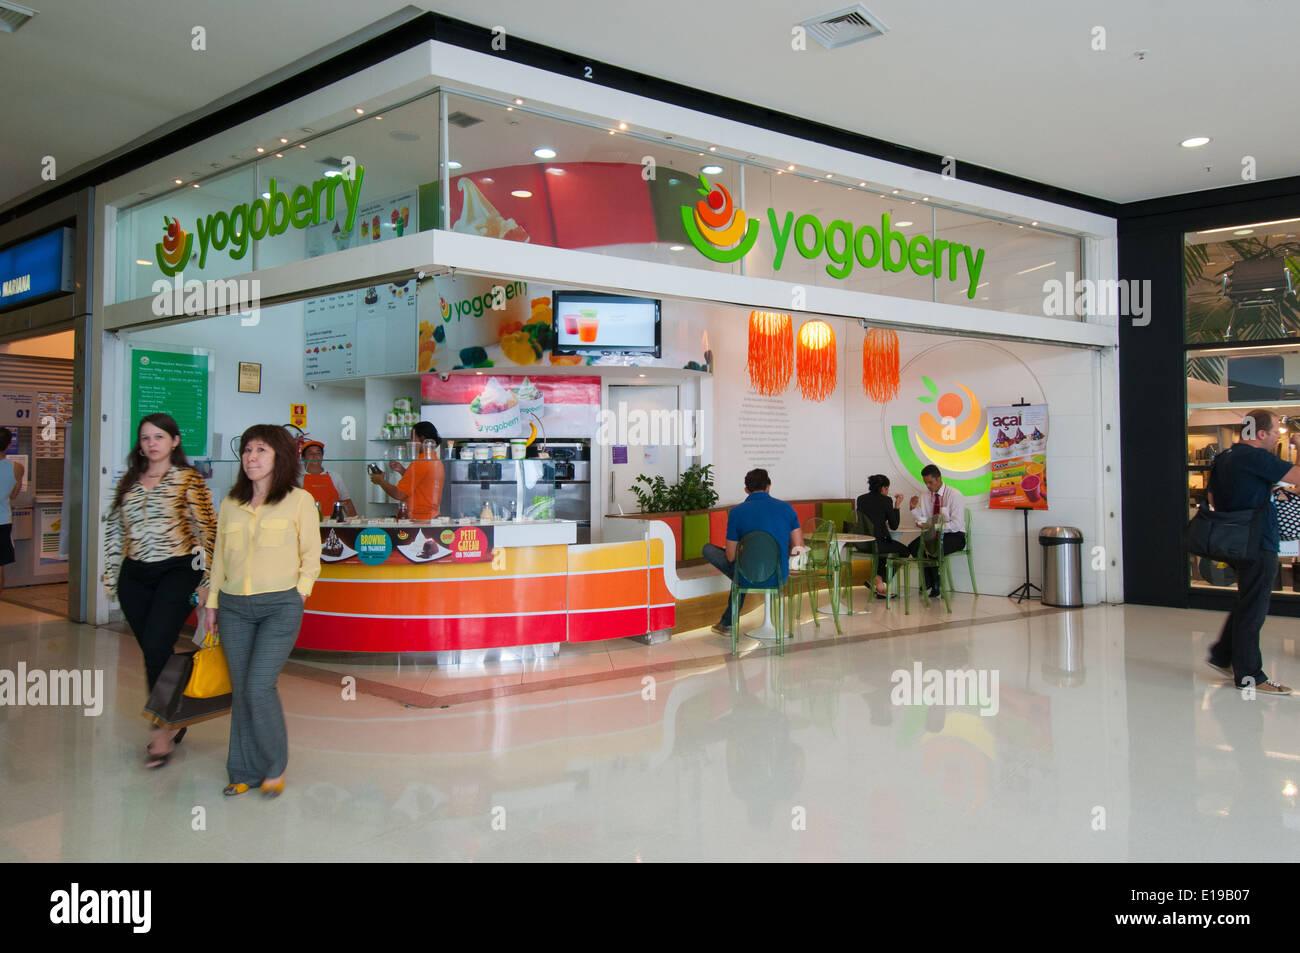 Iguatemi Shopping center Brasilia Brazil - Stock Image